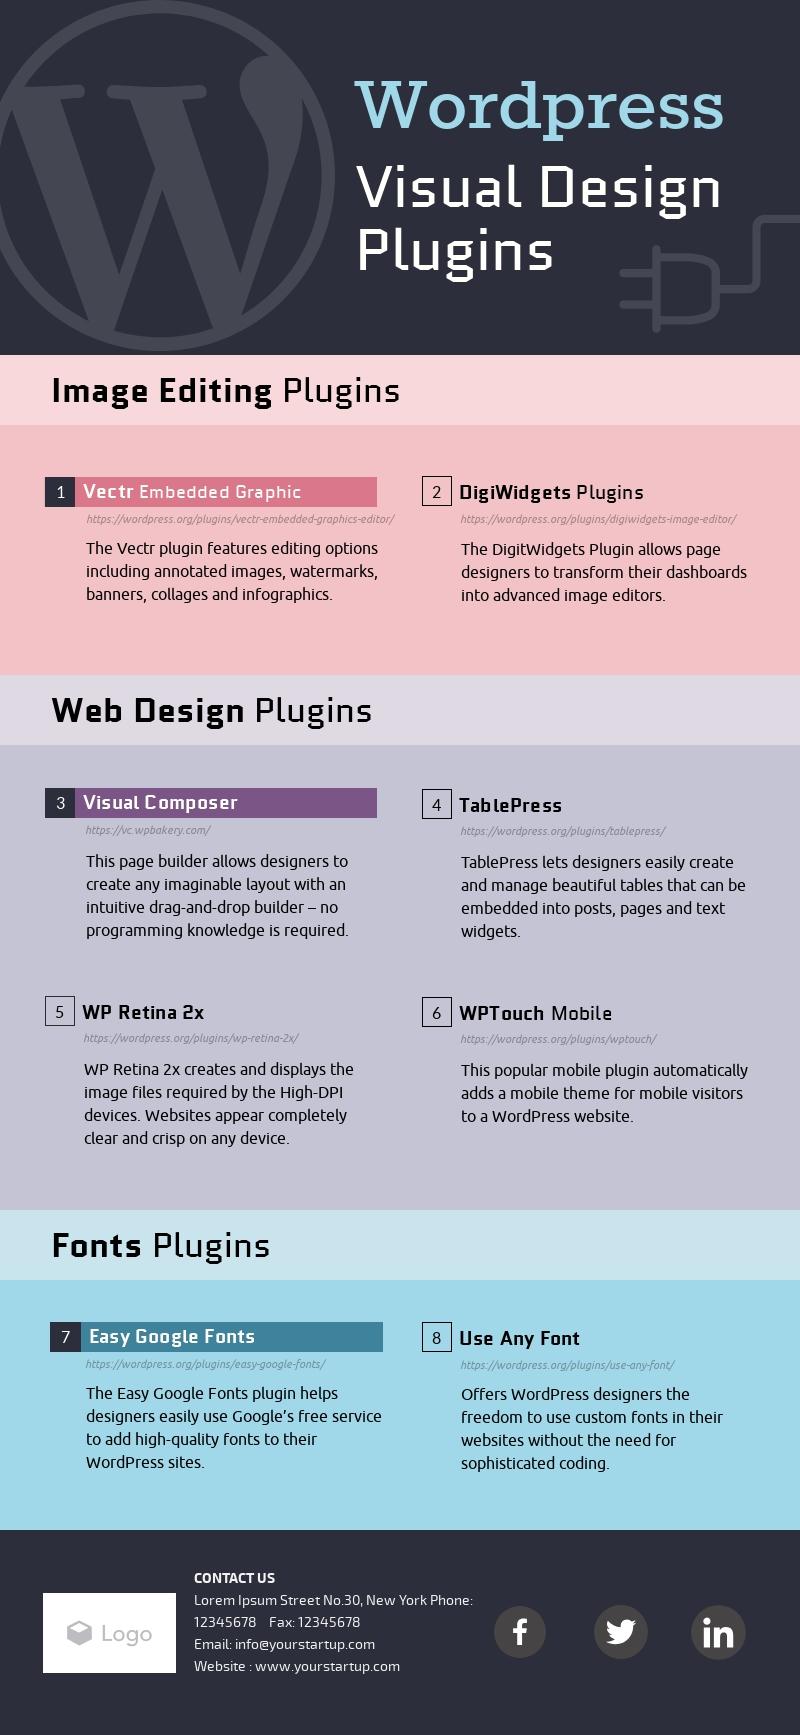 Visual Design Plugins - Infographic Template